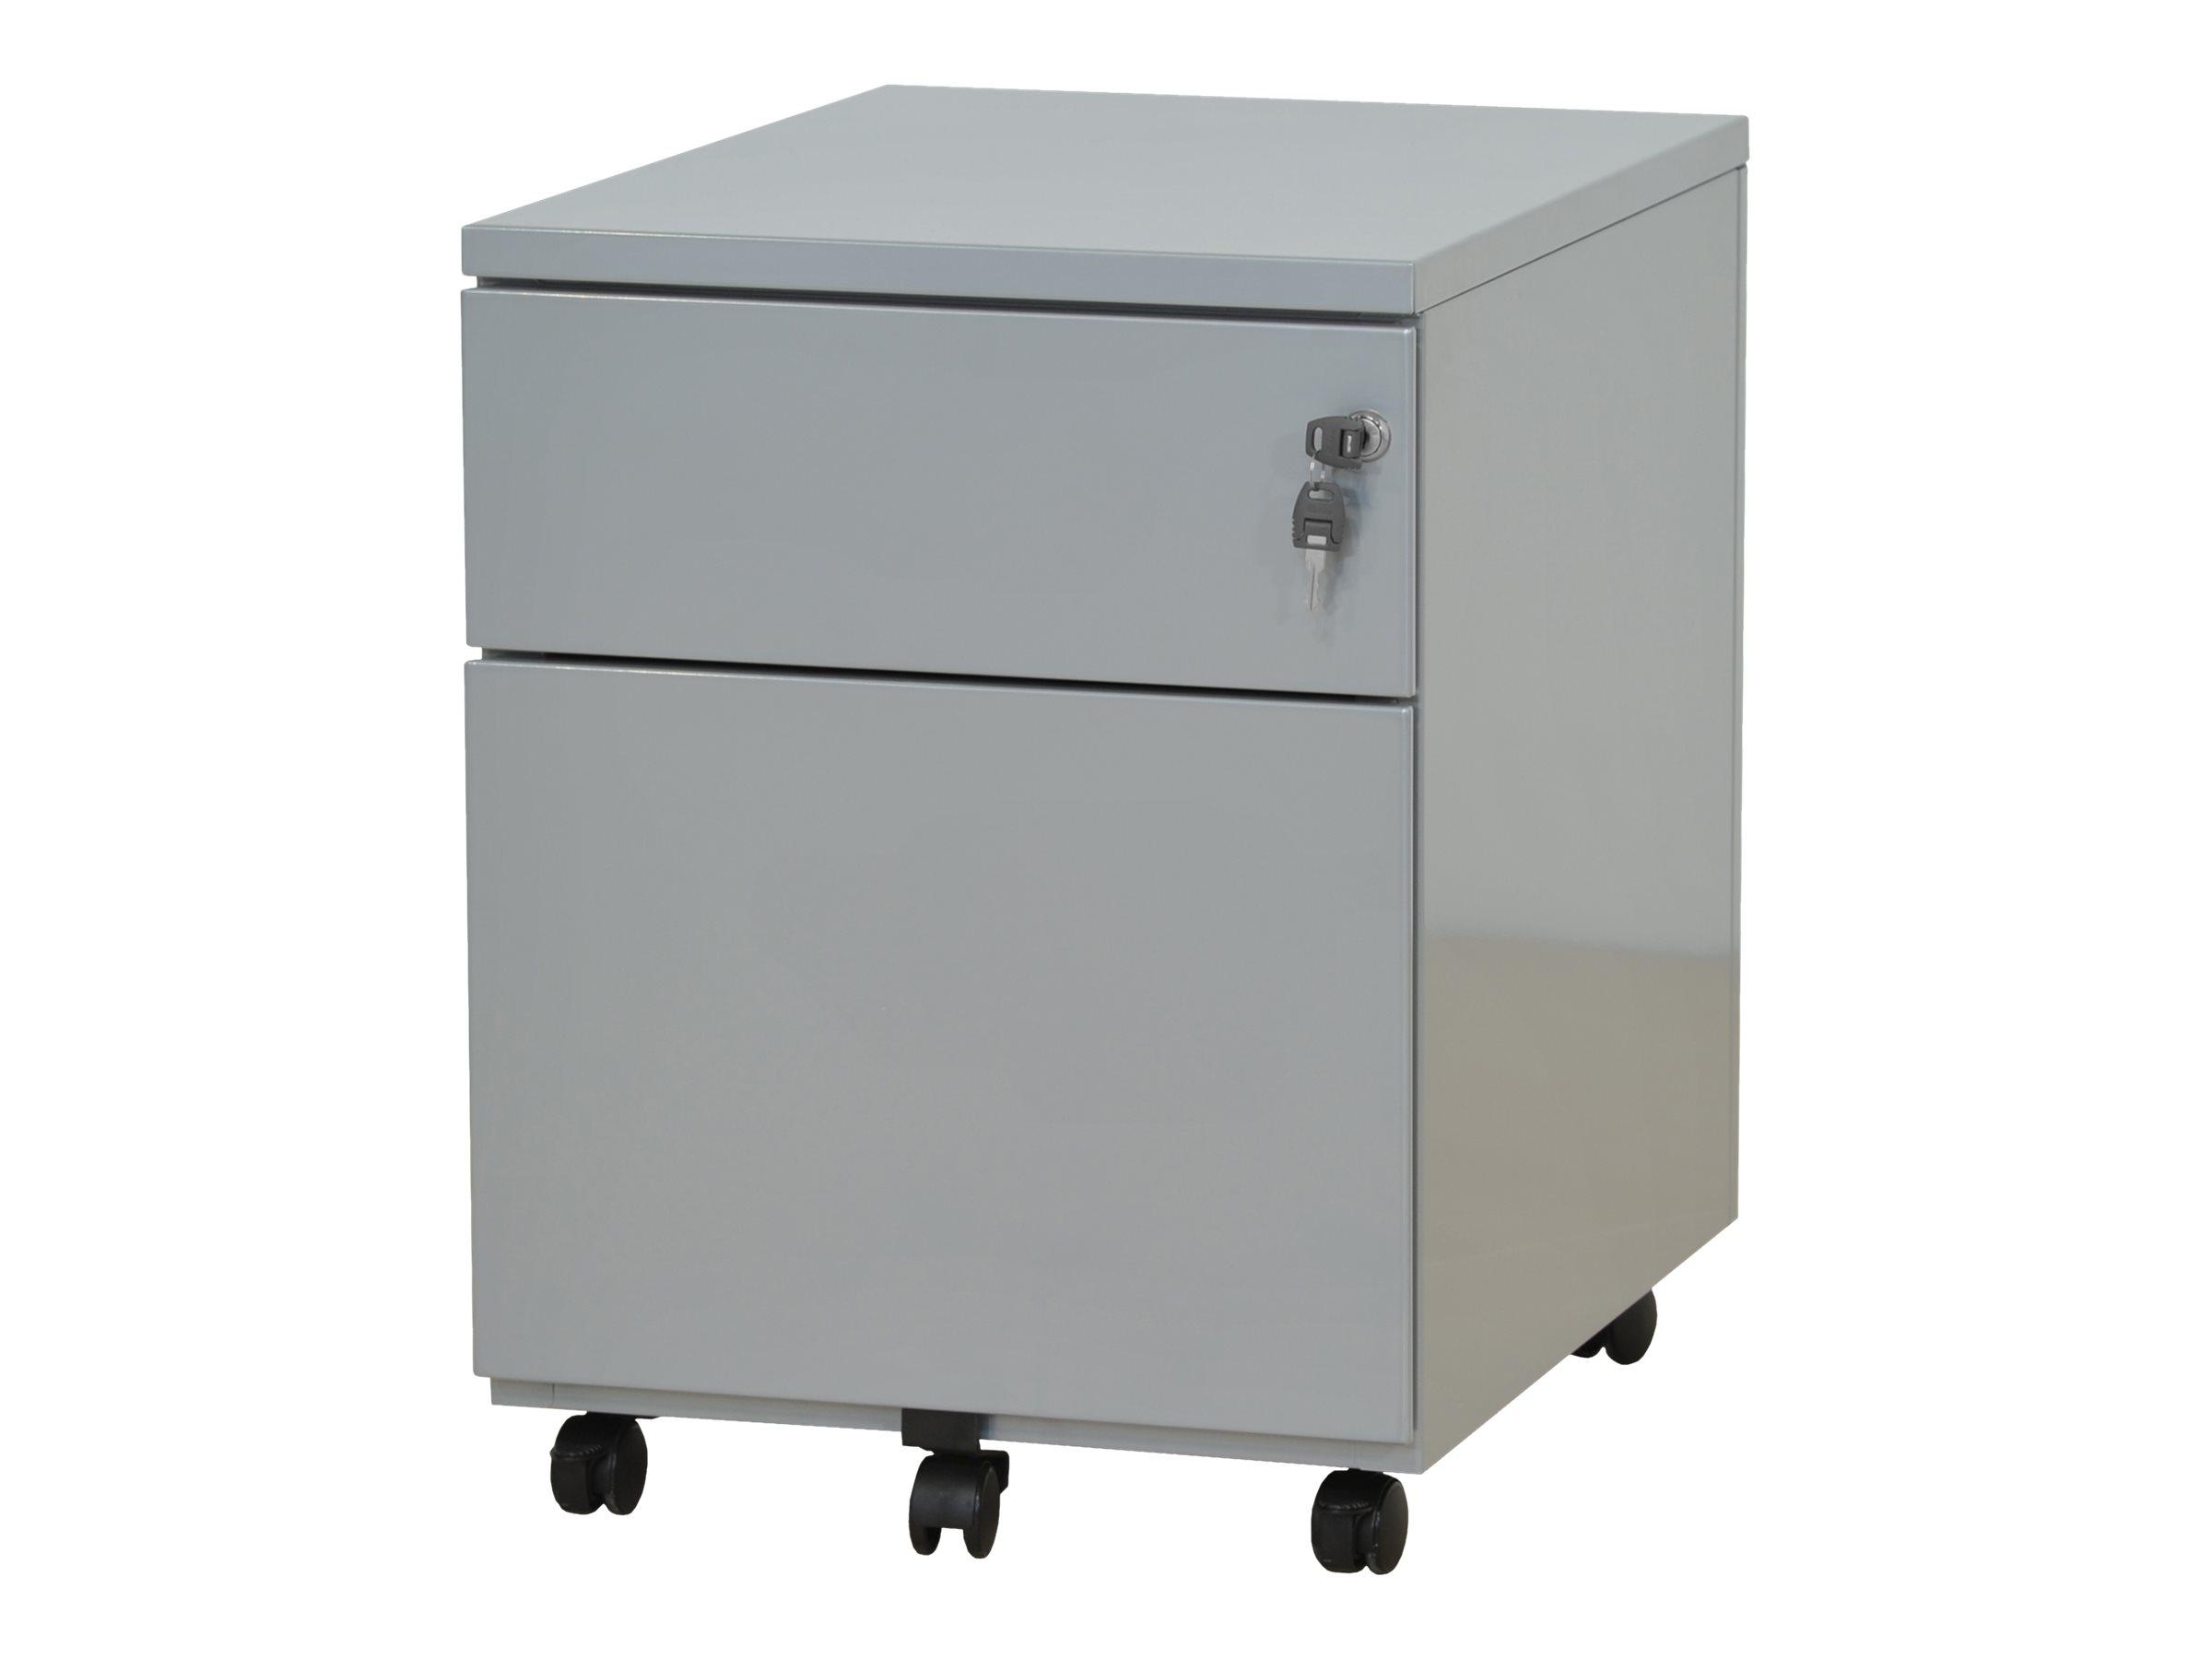 Caisson mobile - 2 tiroirs - gris - 56,7 x 54,1 x 41,8 cm